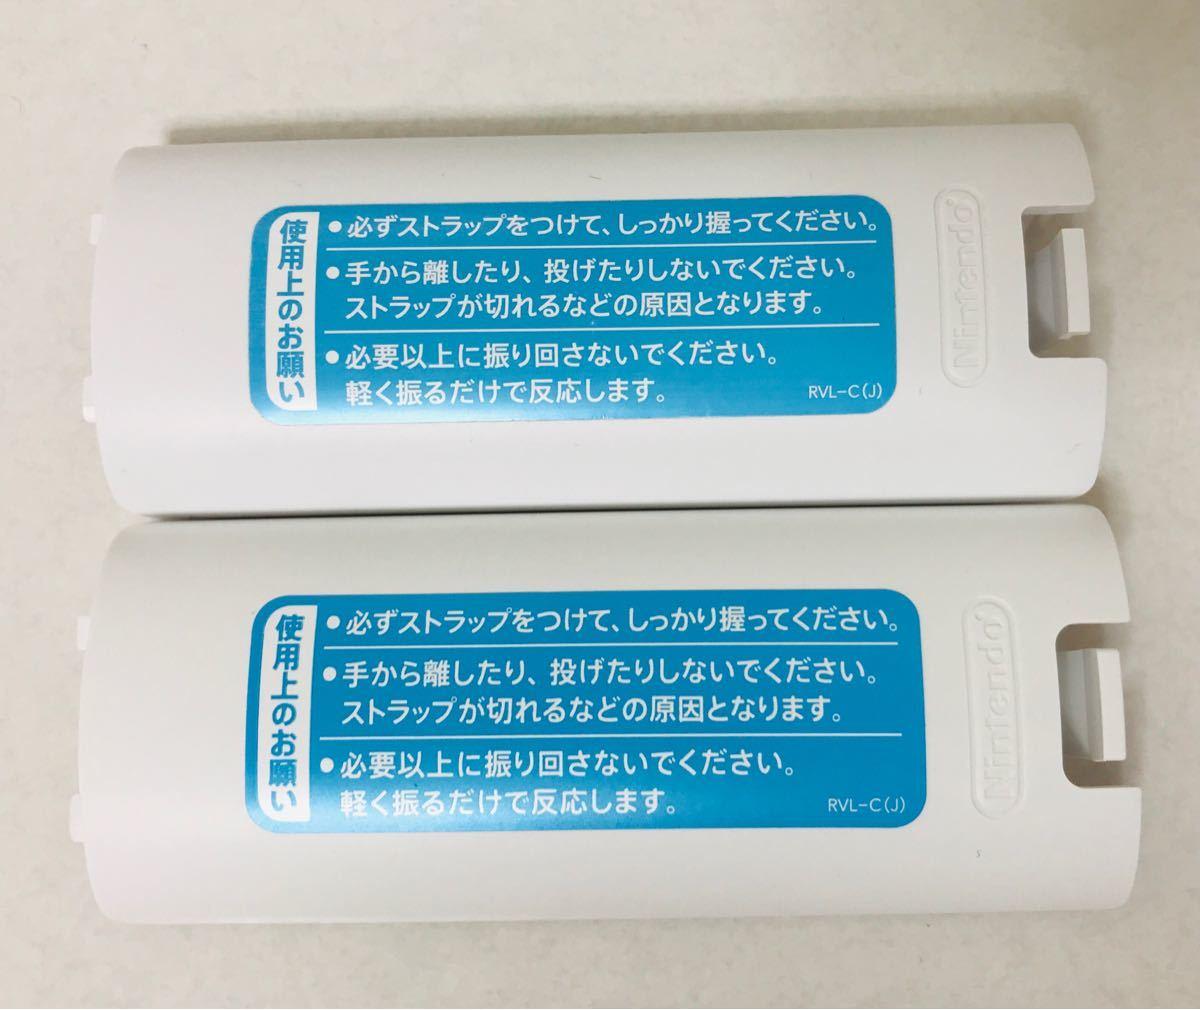 wiiリモコン 電池カバー